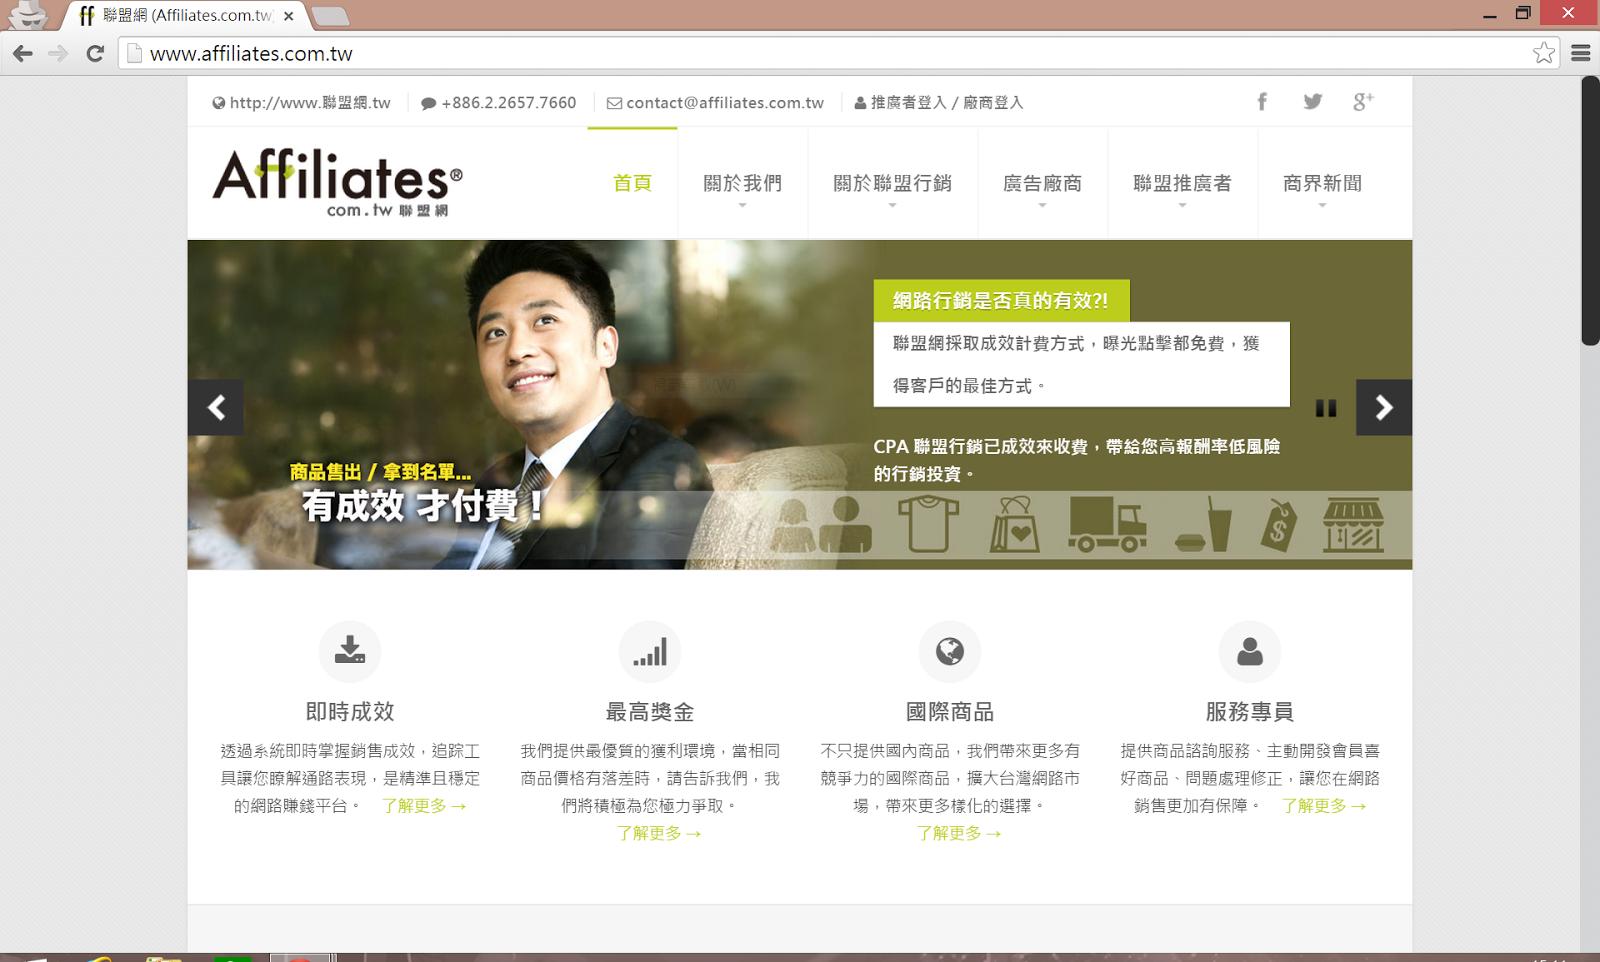 香港也可以用的聯盟行銷 (Affiliate Marketing):Affiliates 聯盟網